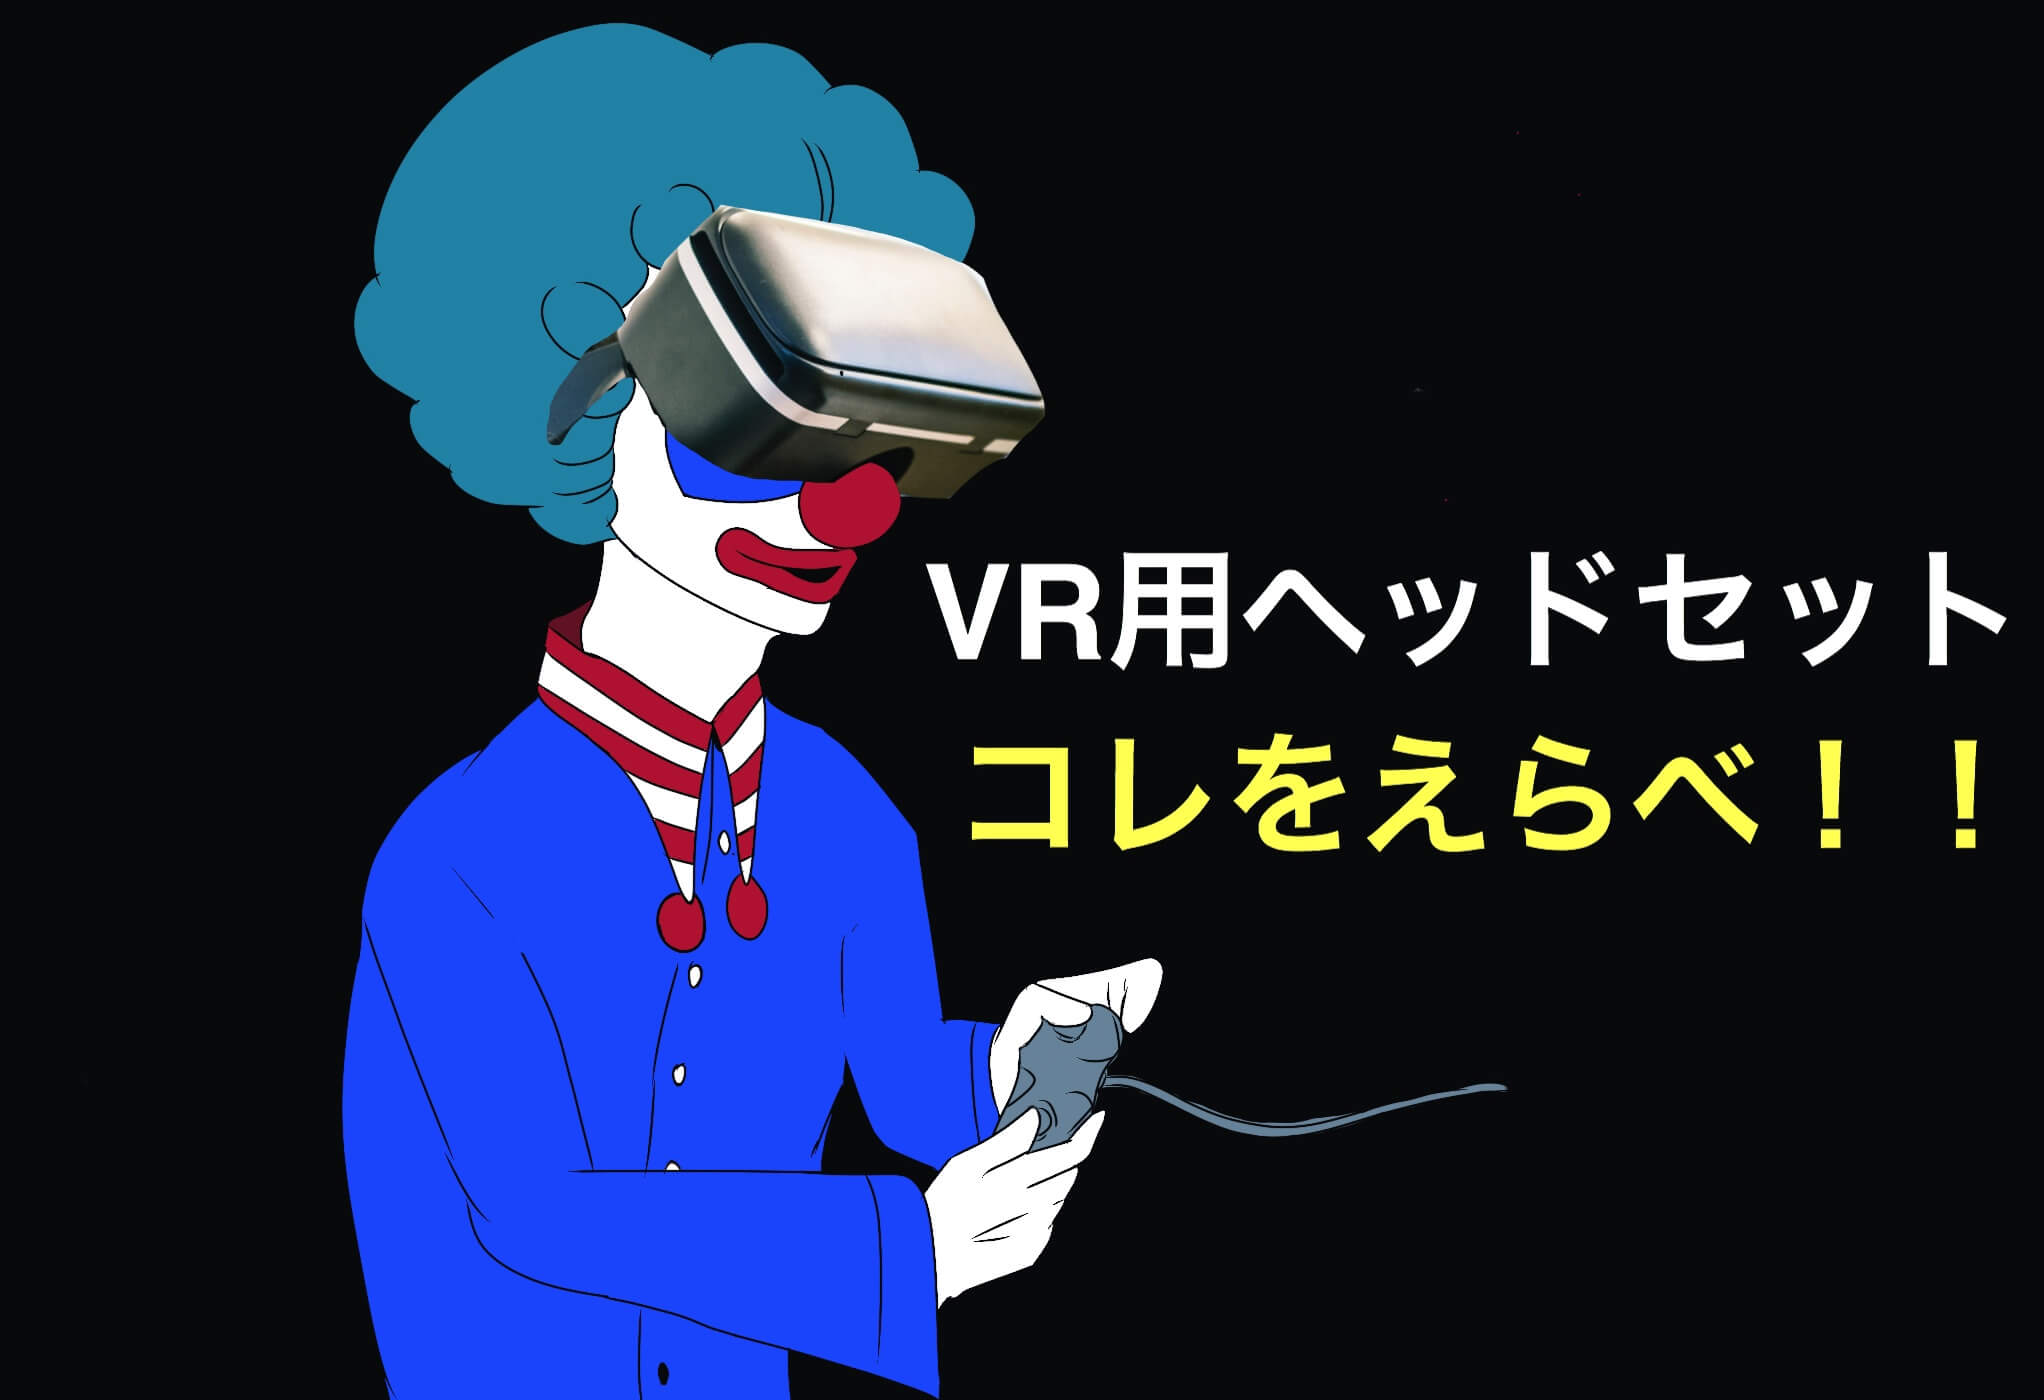 【OculusGo vs PSVR】VR用ヘッドマウントディスプレイ(HMD)はこれで決まり